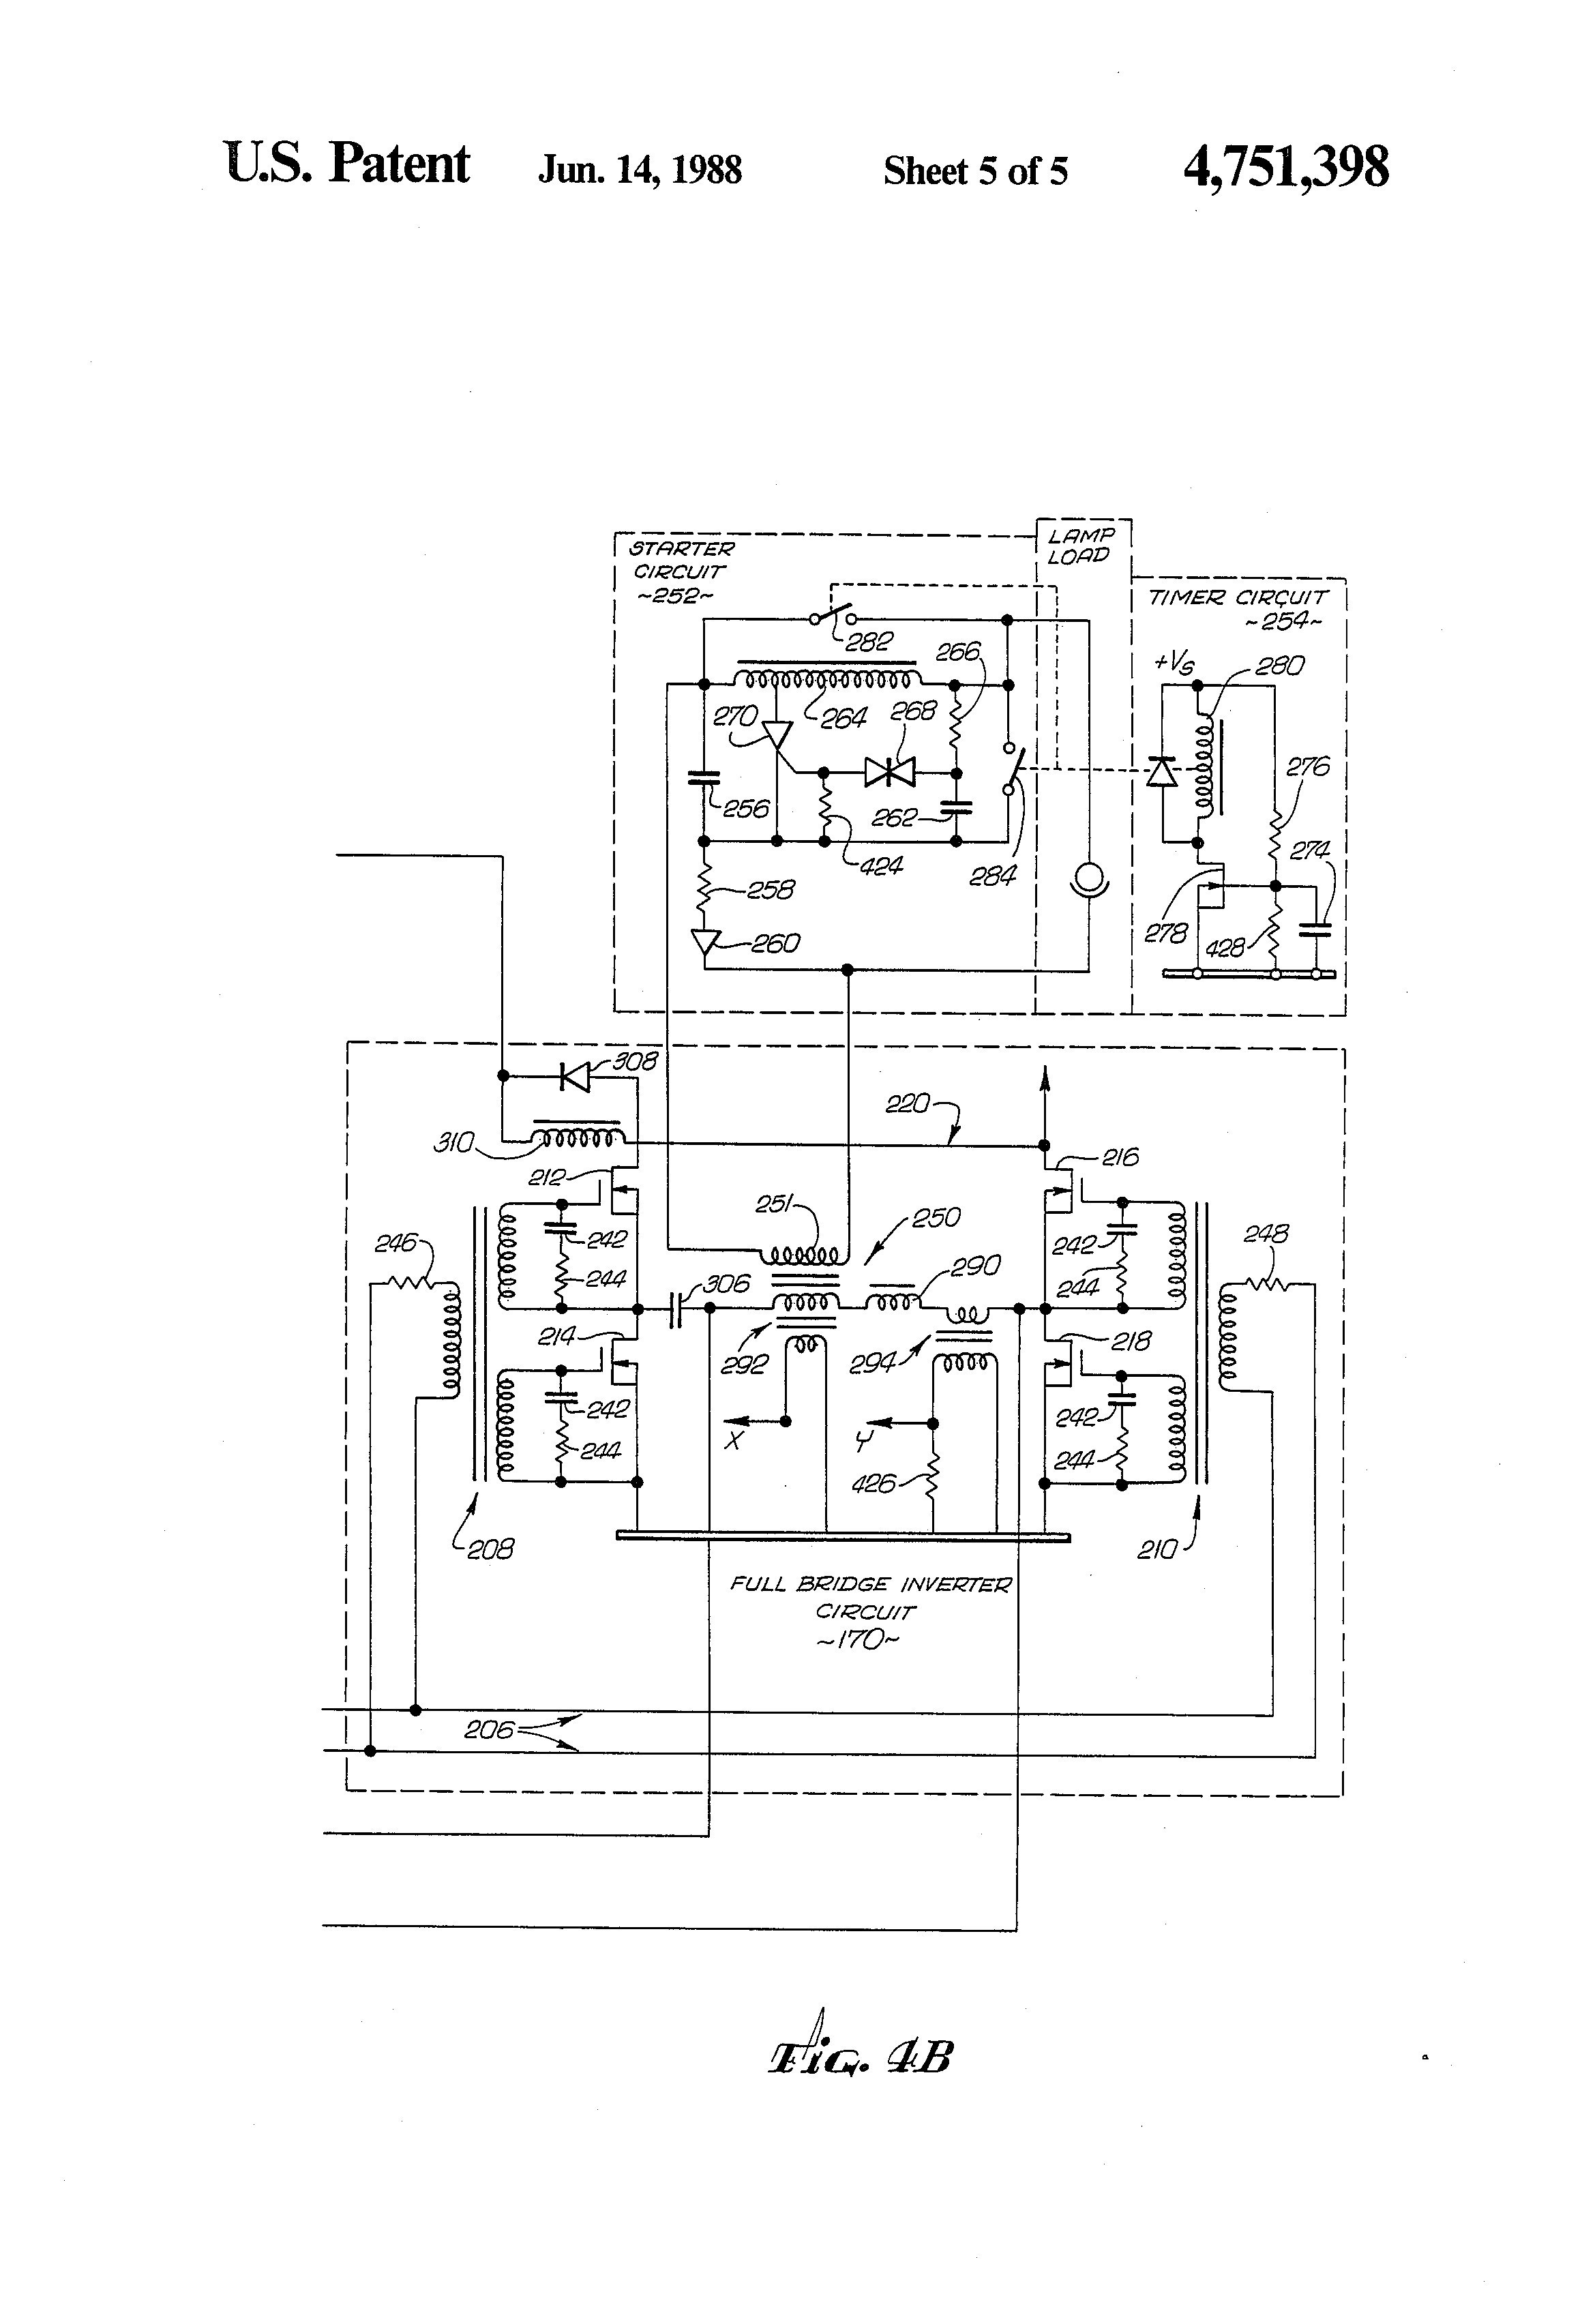 T8 Electronic Ballast Wiring Diagram Fresh Philips Advance Ballast Wiring Diagram For Philips Advance Ballast